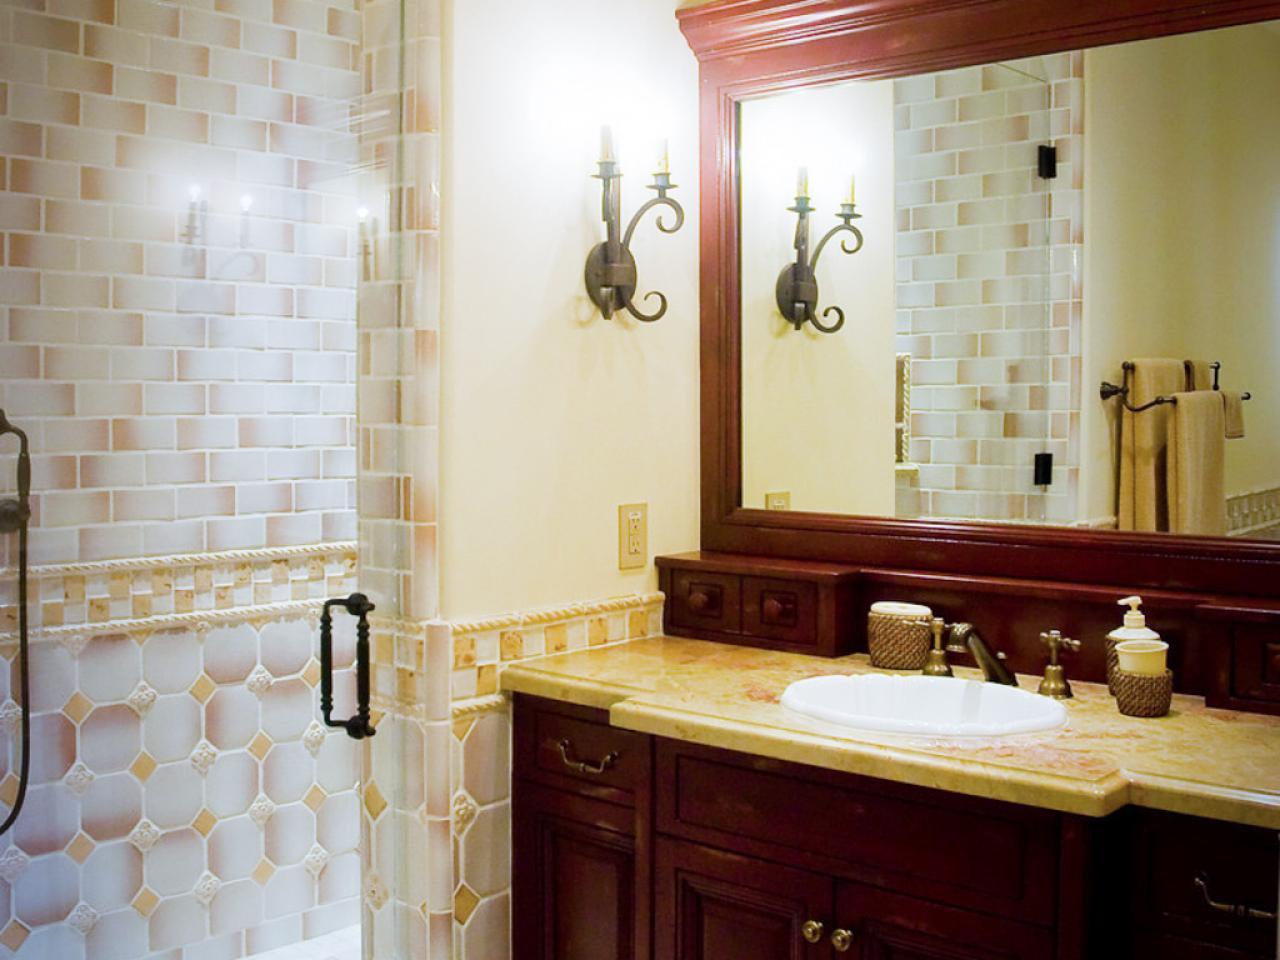 Original_Milk-and-Honey-Design-bathroom-tile-detail-vanity_4x3.jpg.rend.hgtvcom.1280.960